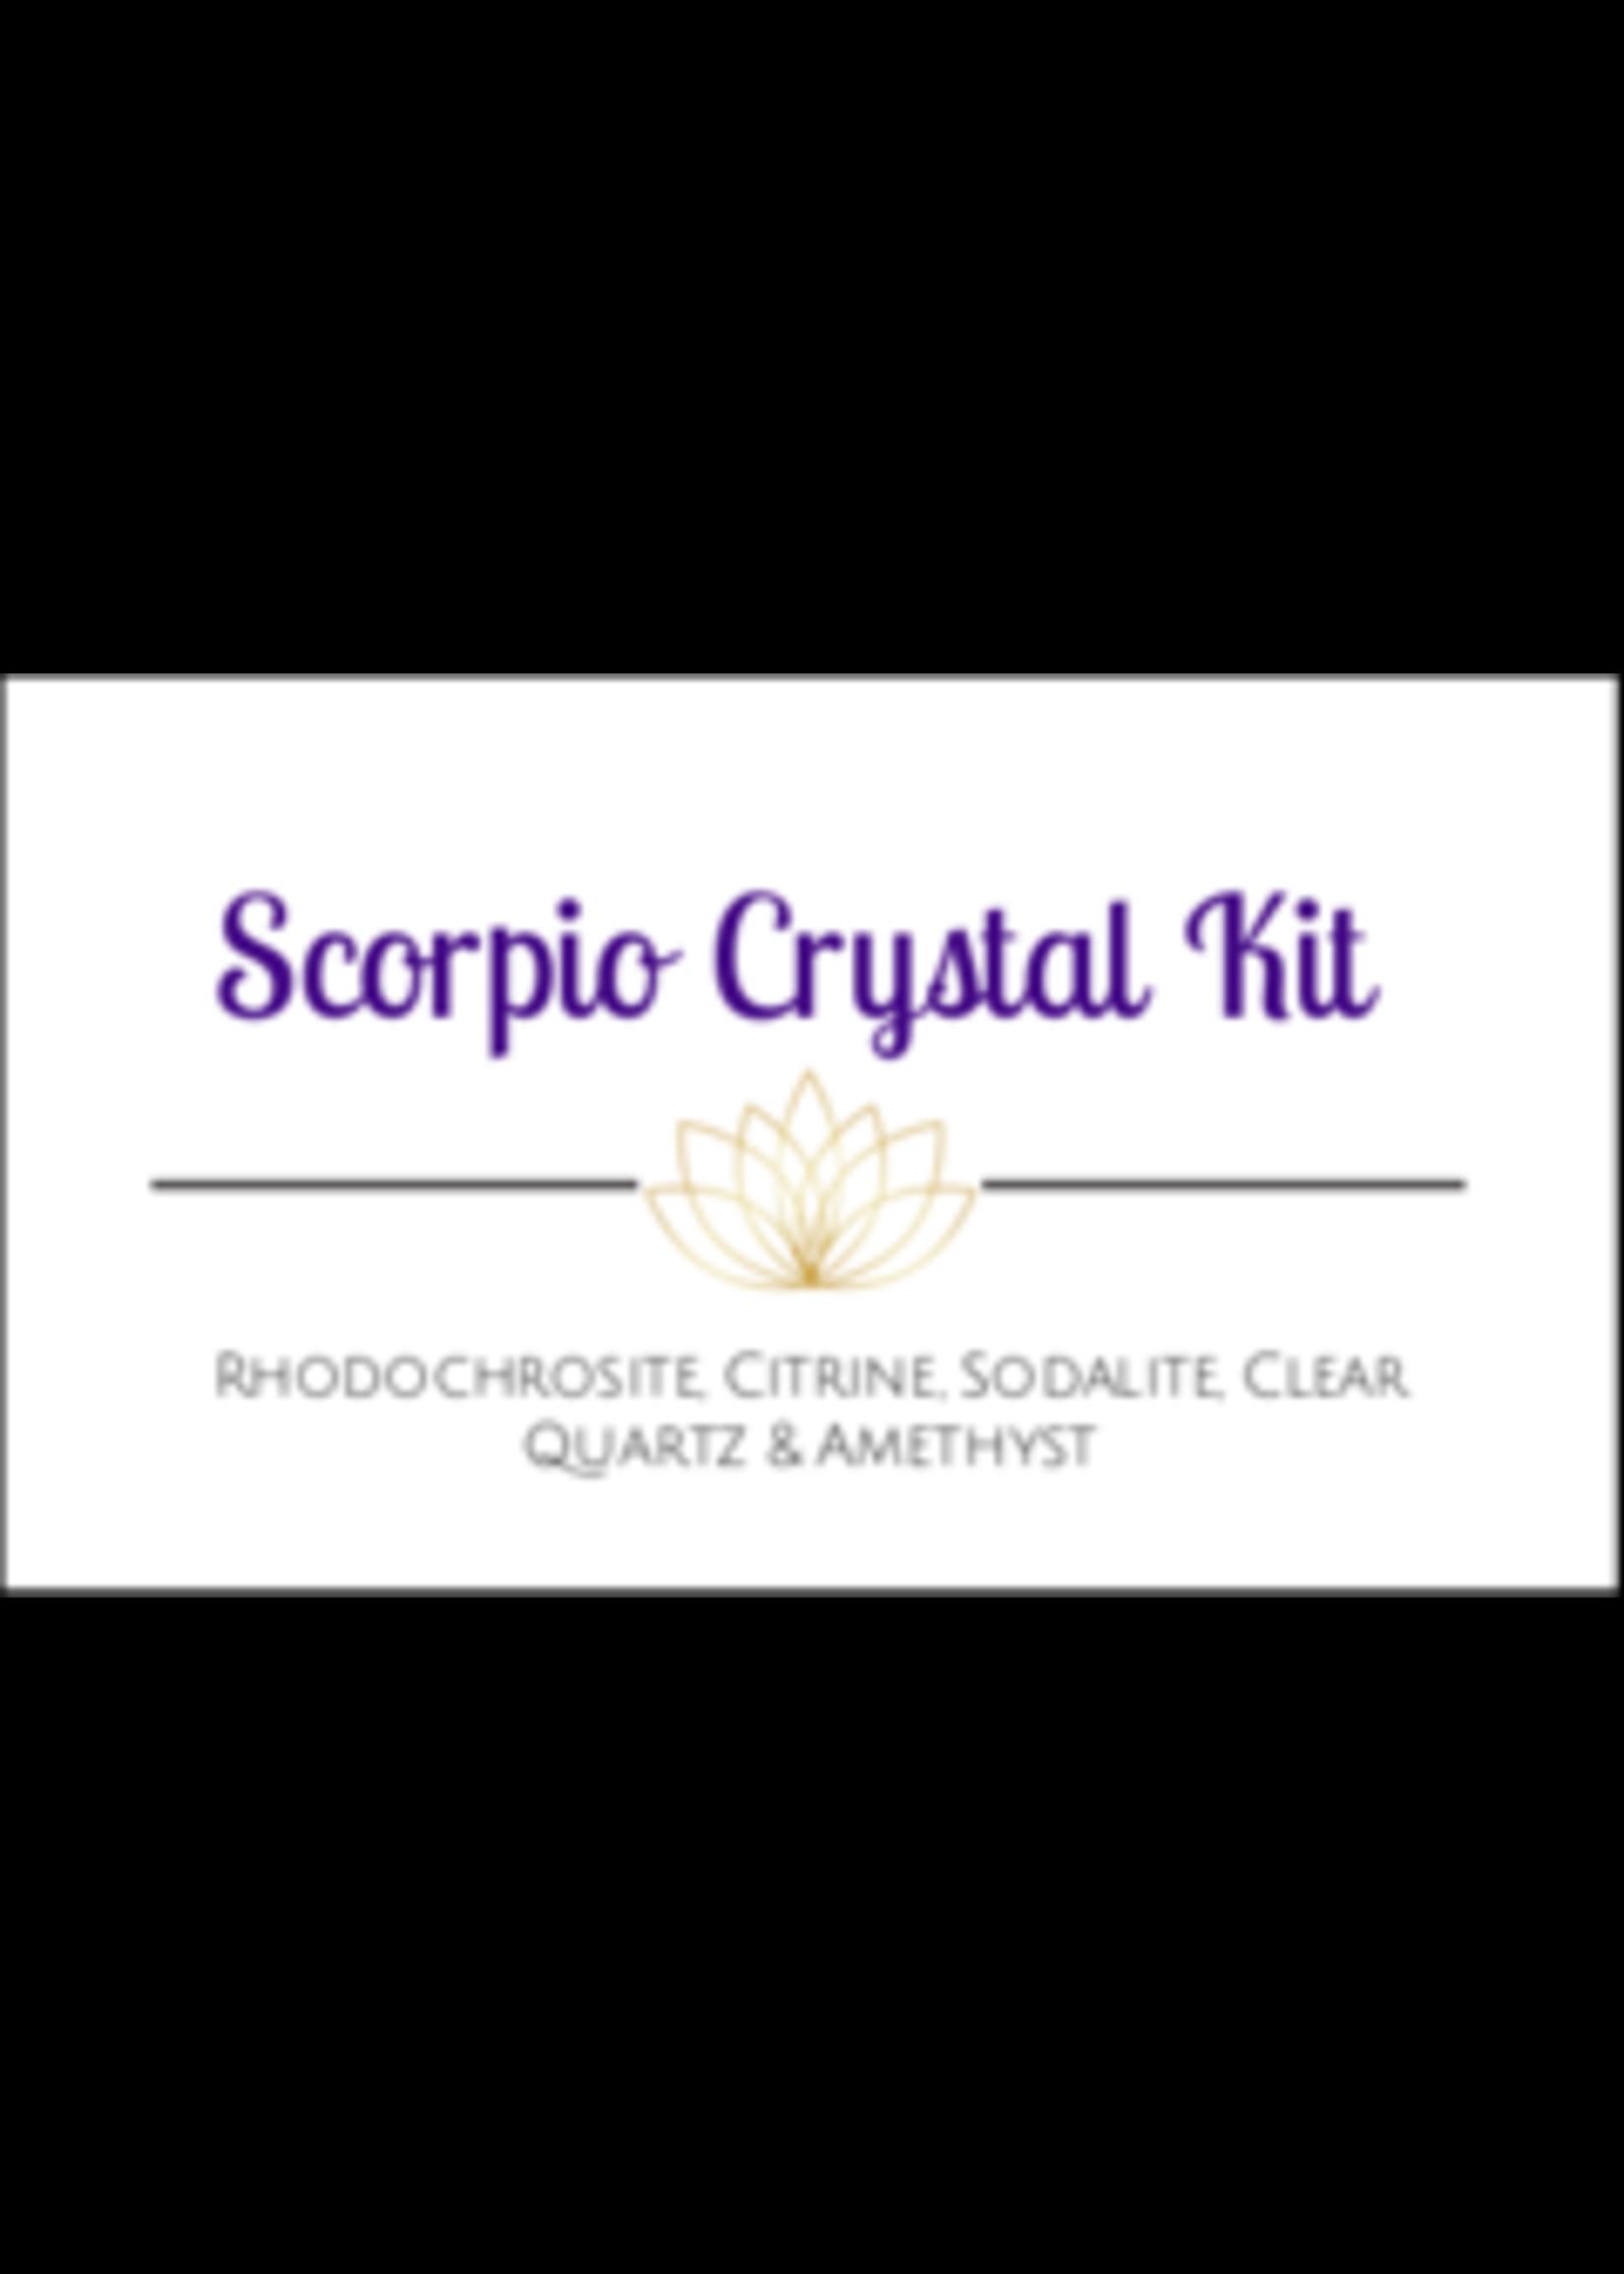 Scorpio Zodiac Crystal Kit Cards - Box of 100